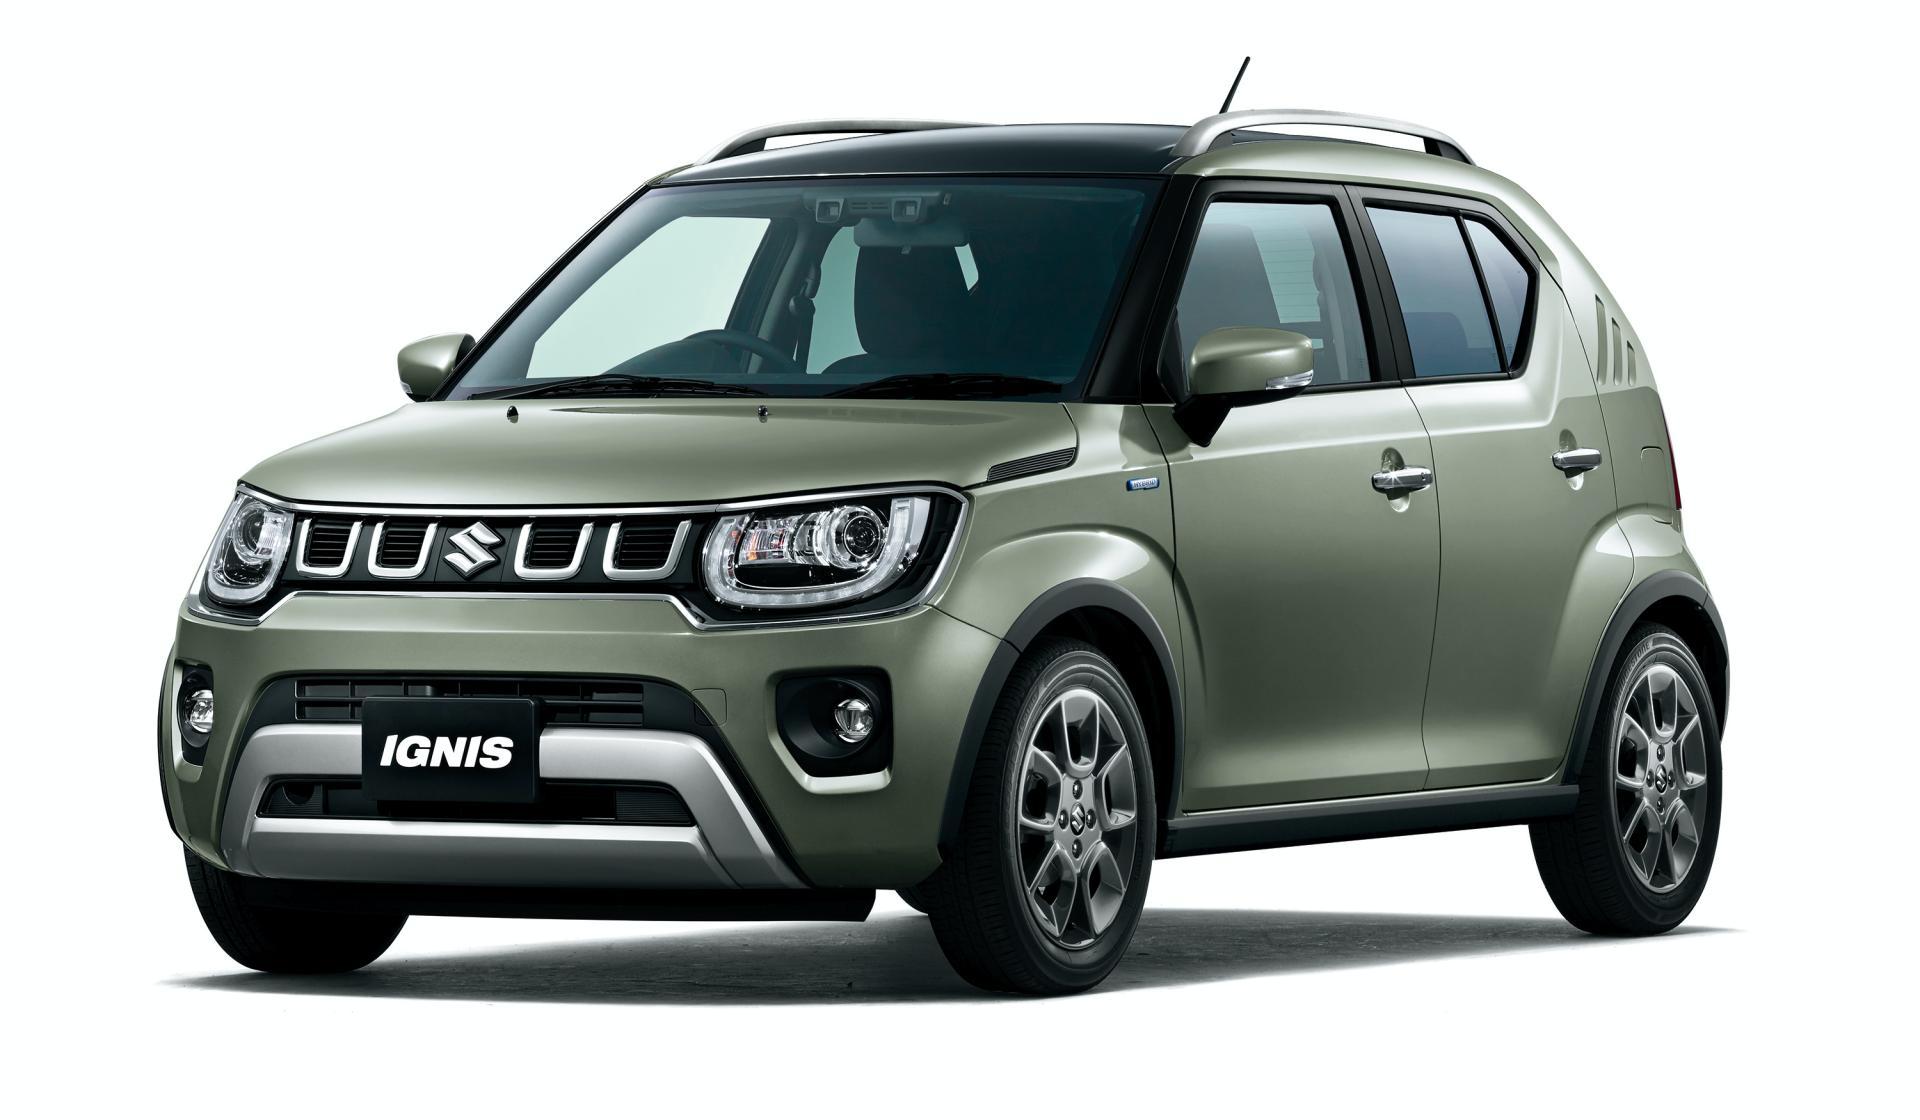 2020-Suzuki-Ignis-Hybrid-MF-JDM-spec-1